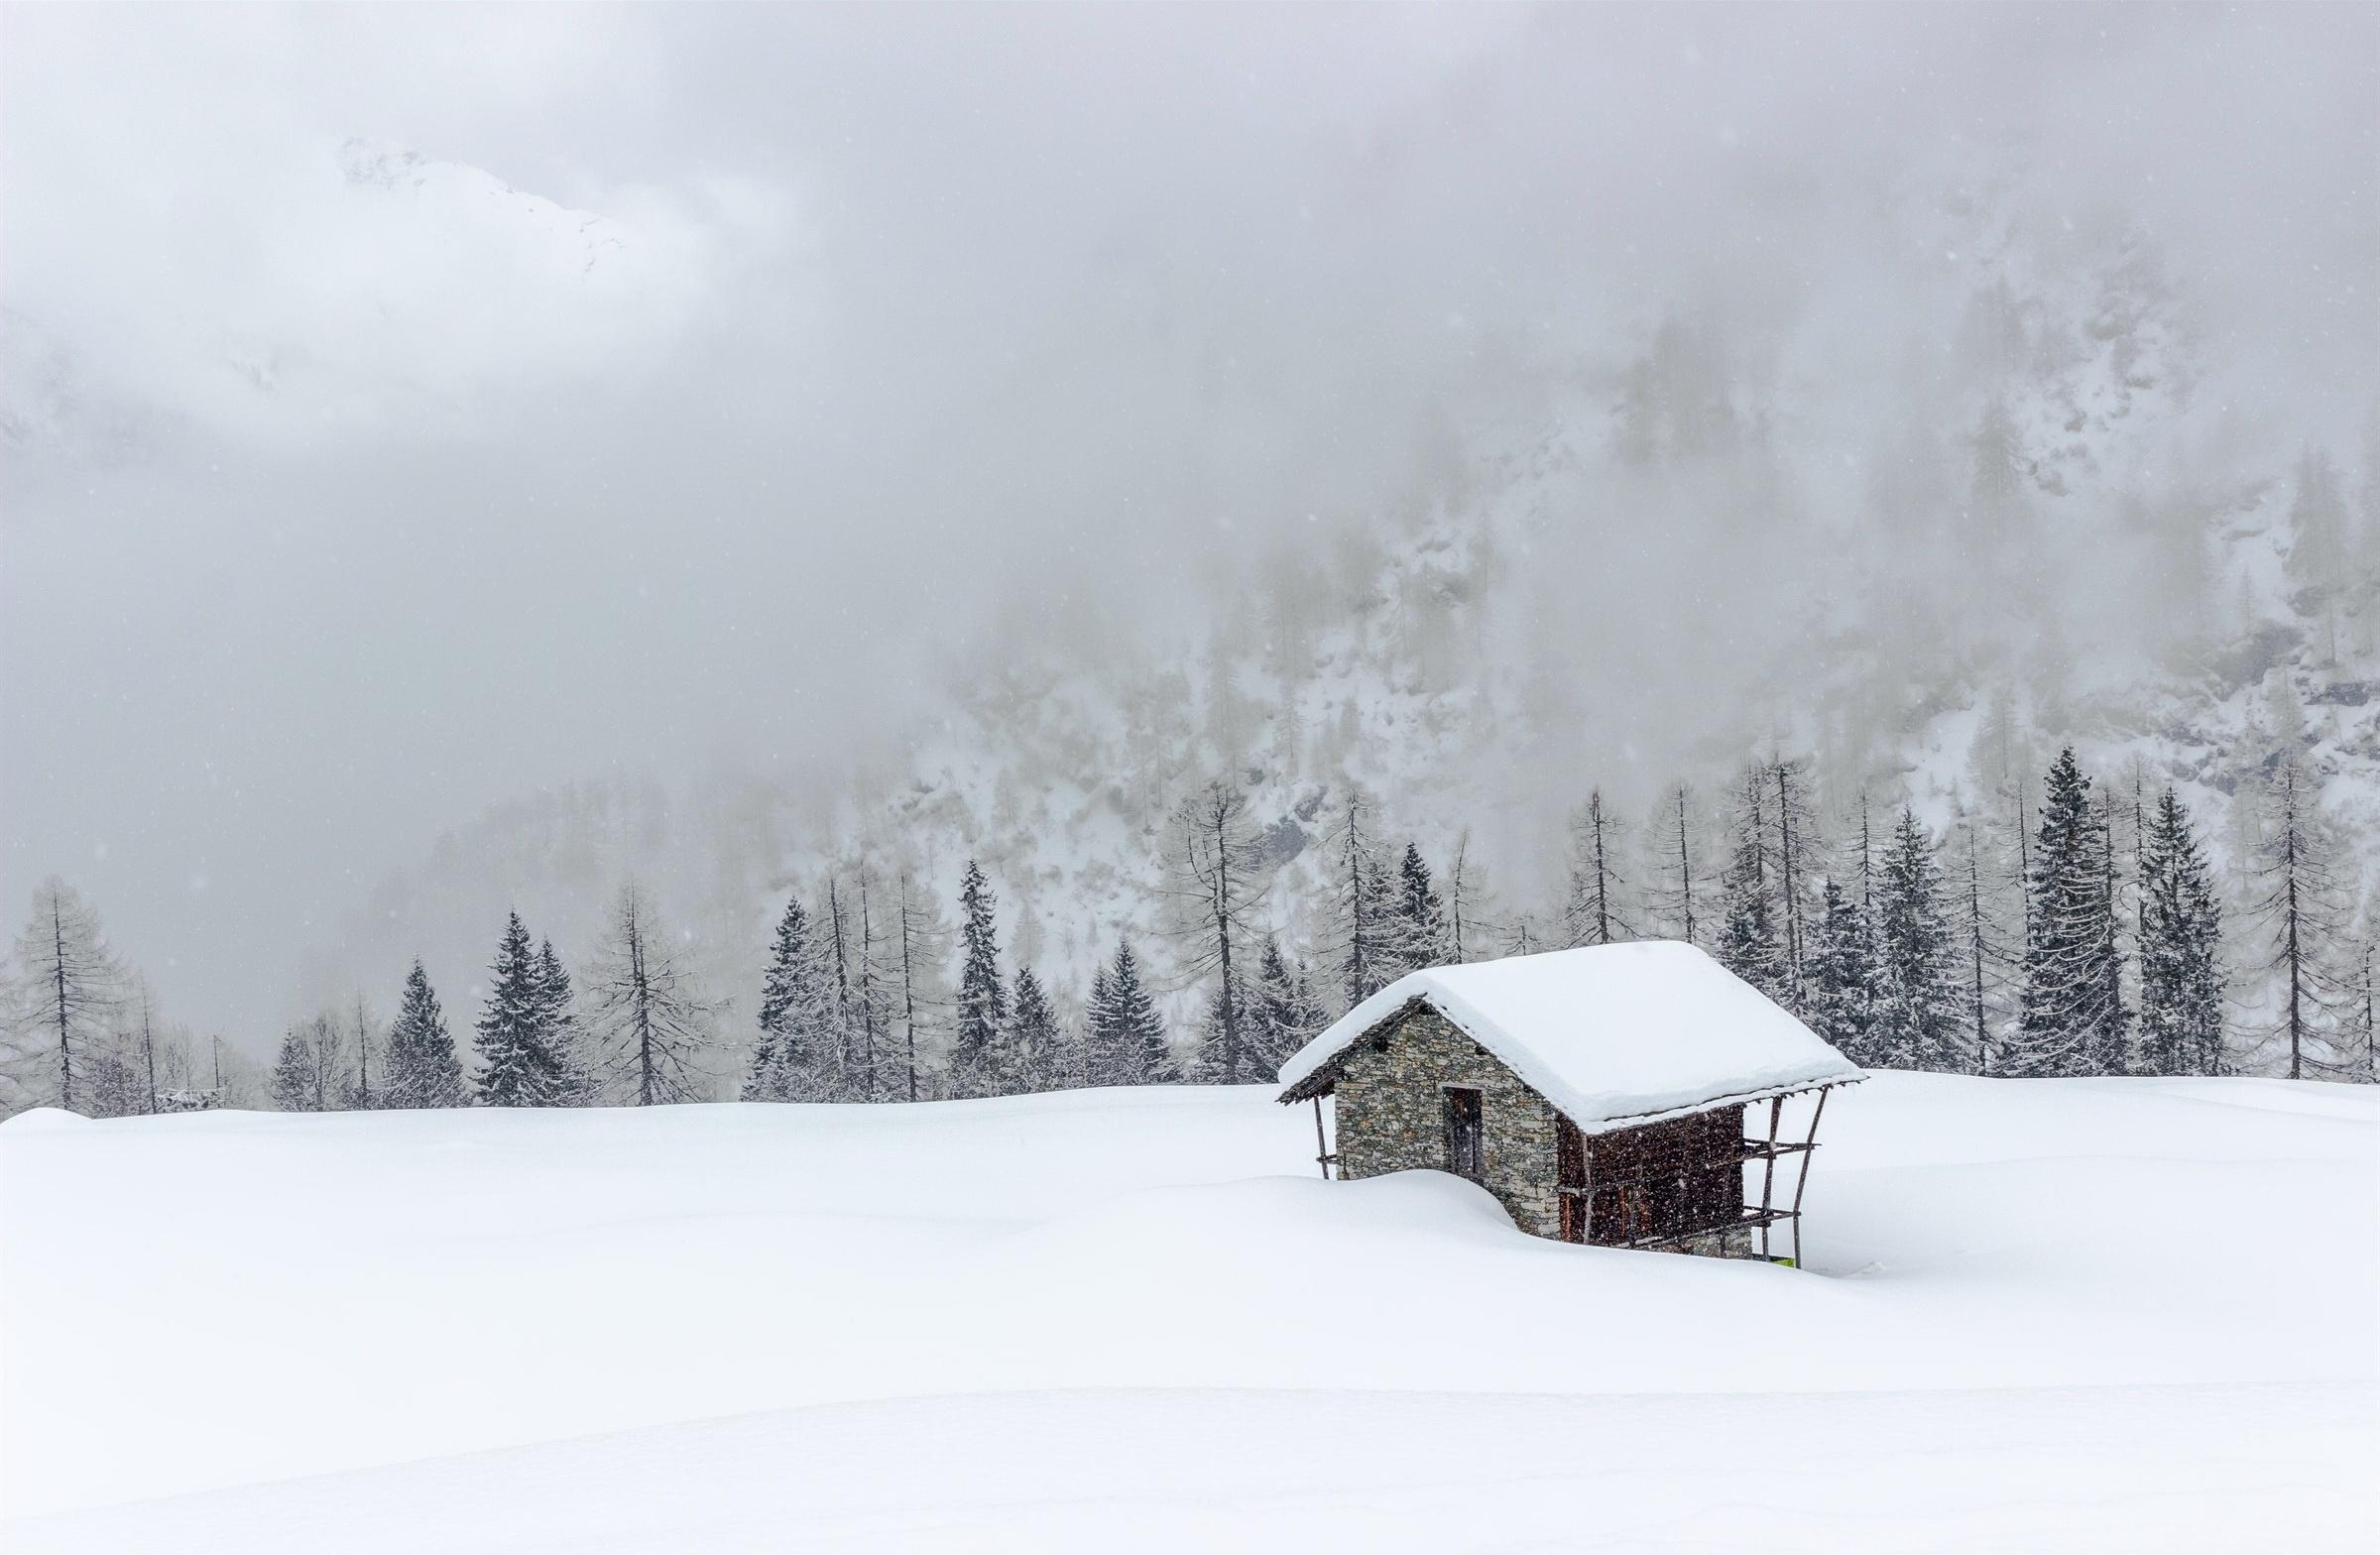 снег горы туман snow mountains fog  № 1146687 бесплатно